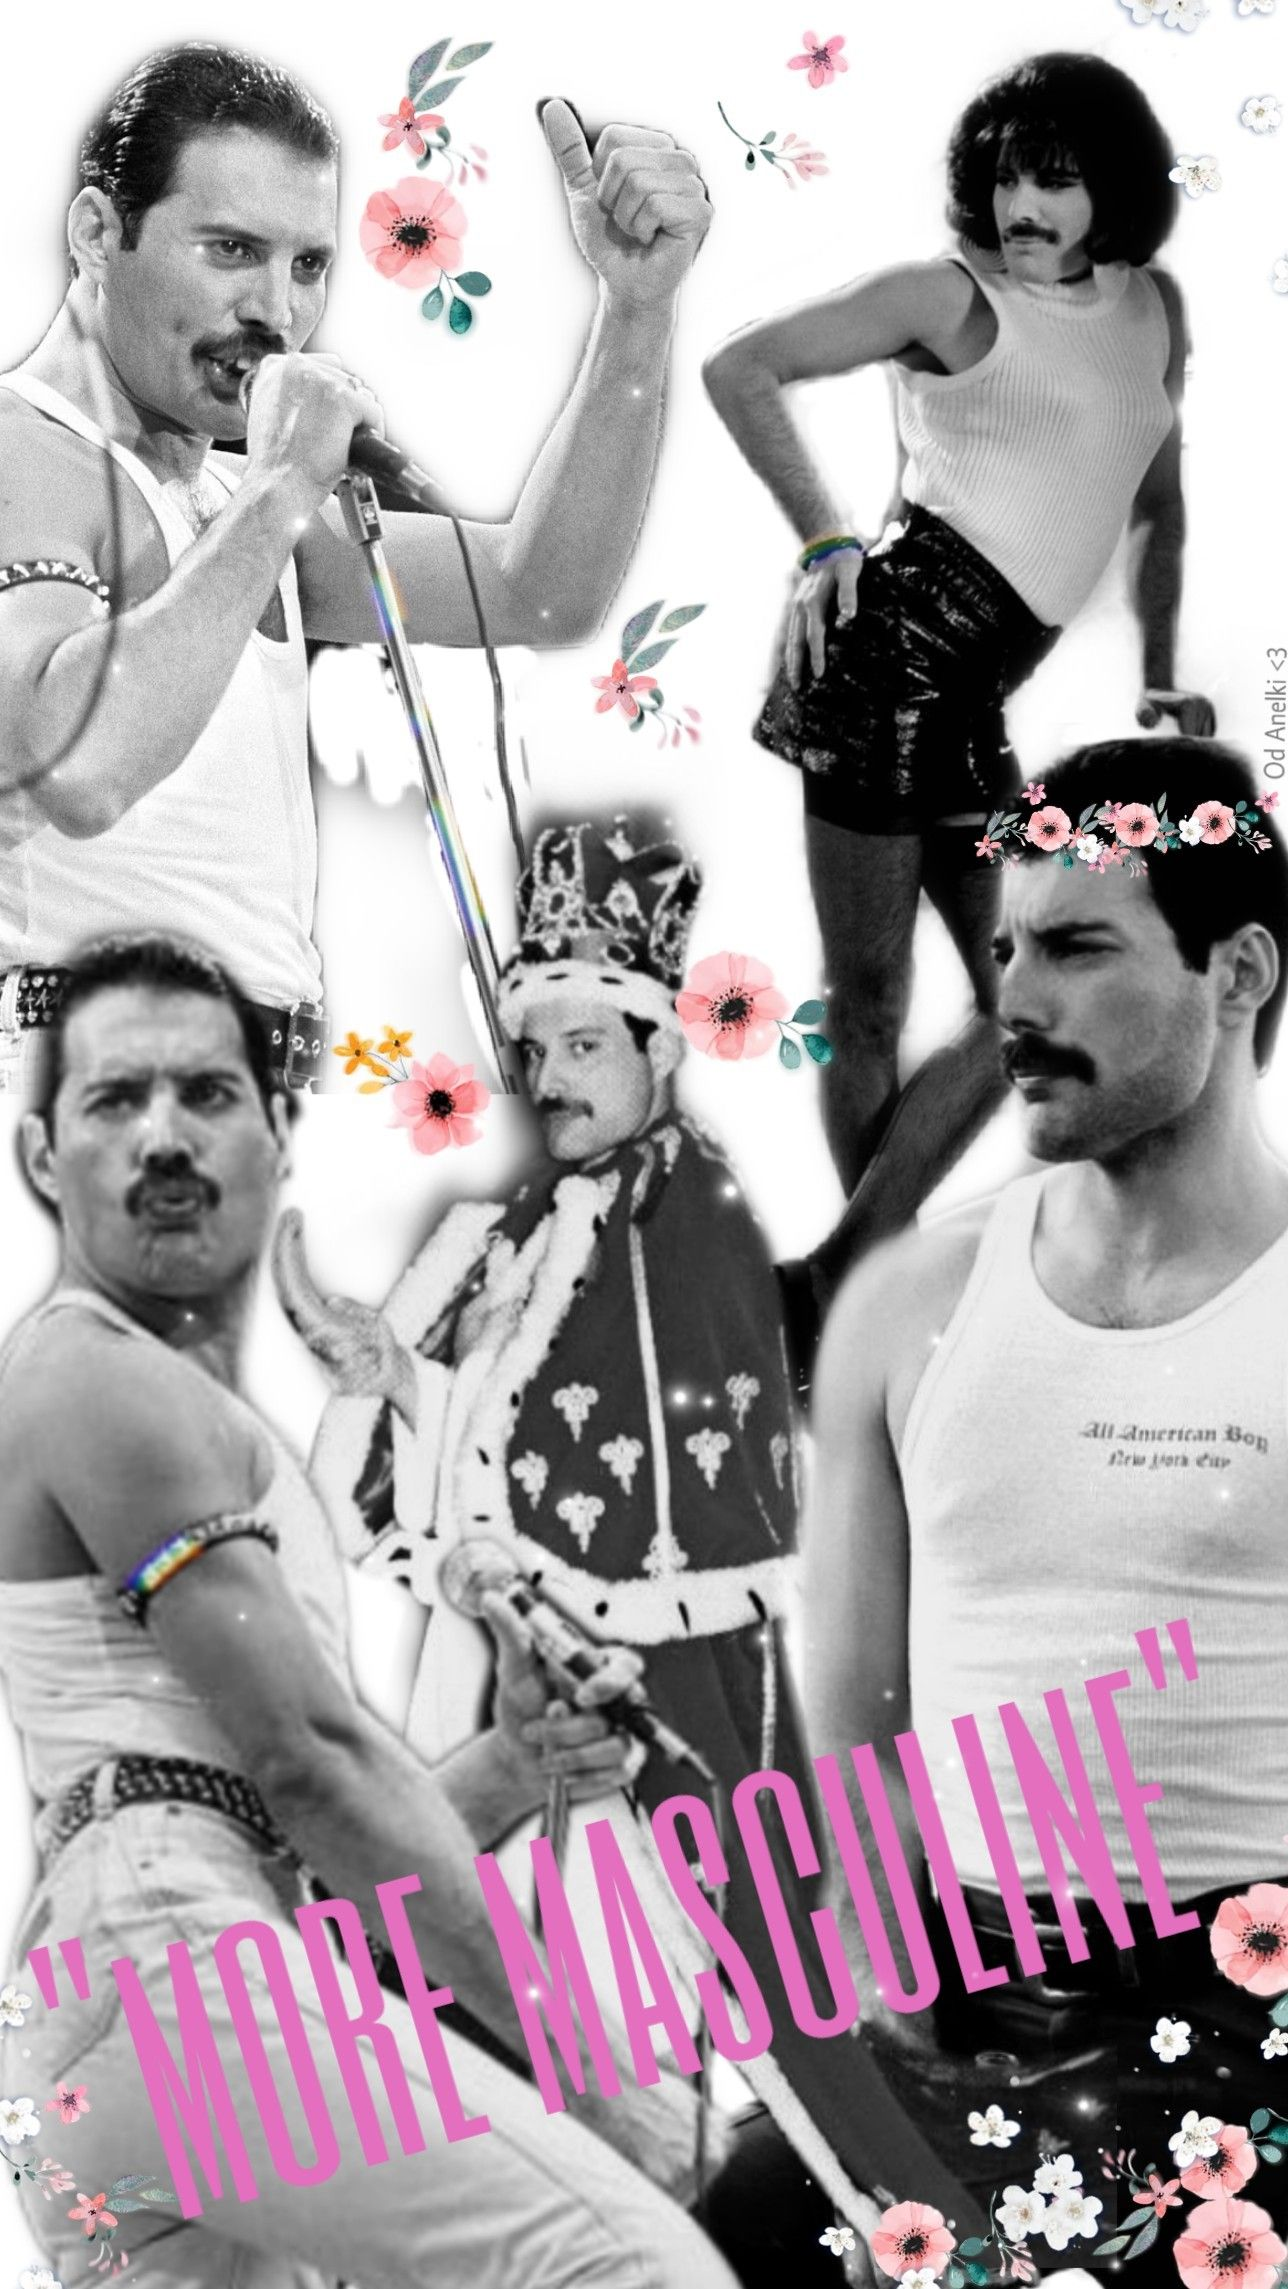 Freddie Mercury Wallpaper Queen By Lordanel Queen Freddie Mercury Freddie Mercury Queens Wallpaper